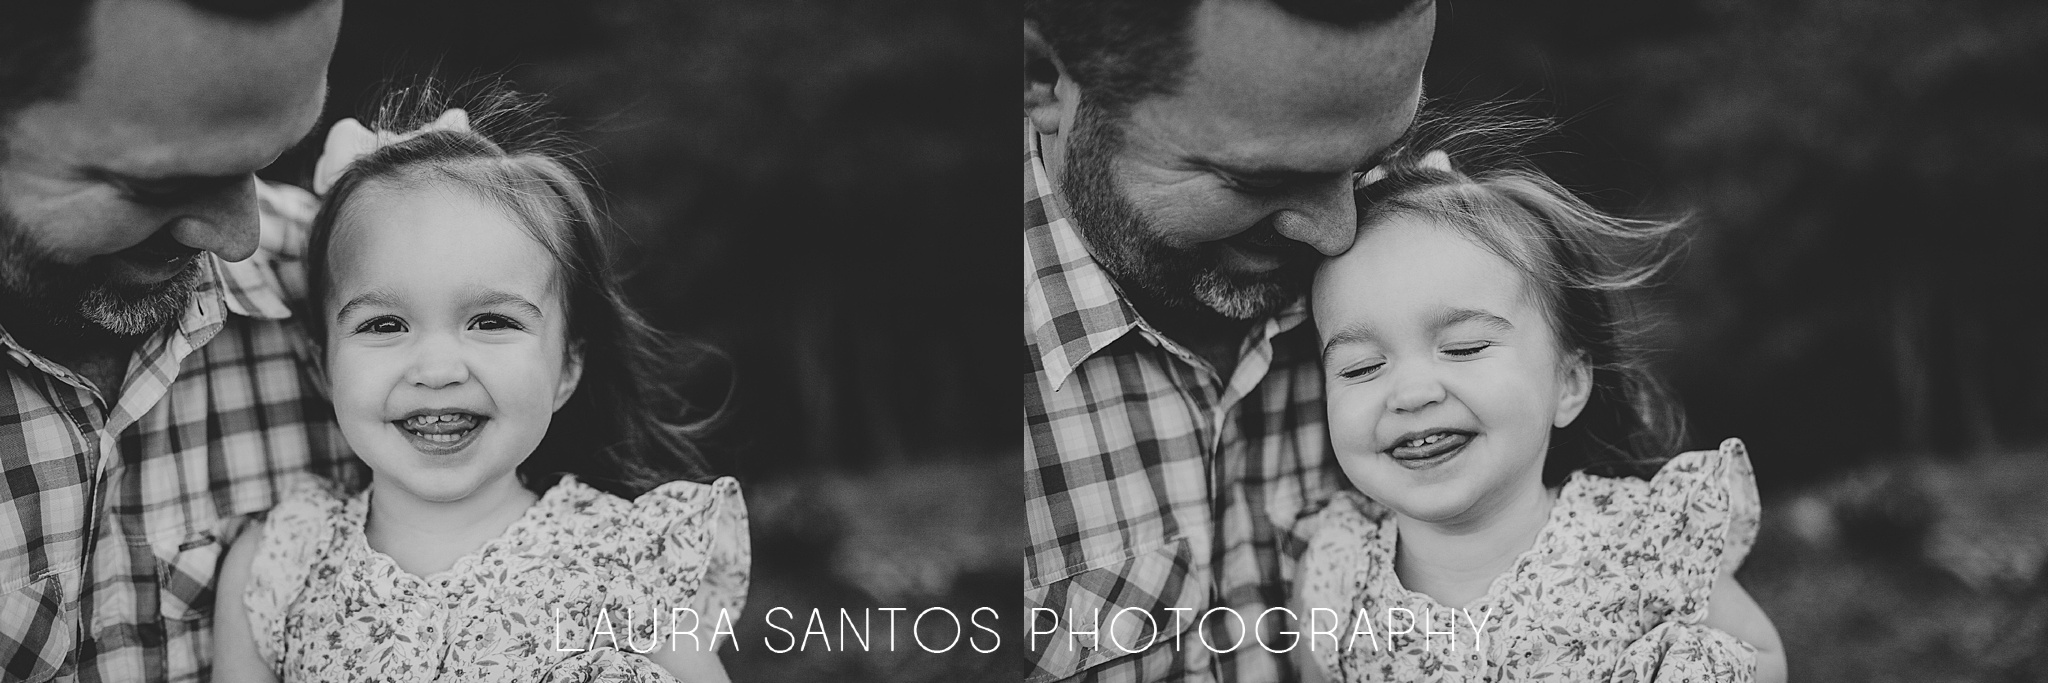 Laura Santos Photography Portland Oregon Family Photographer_0512.jpg